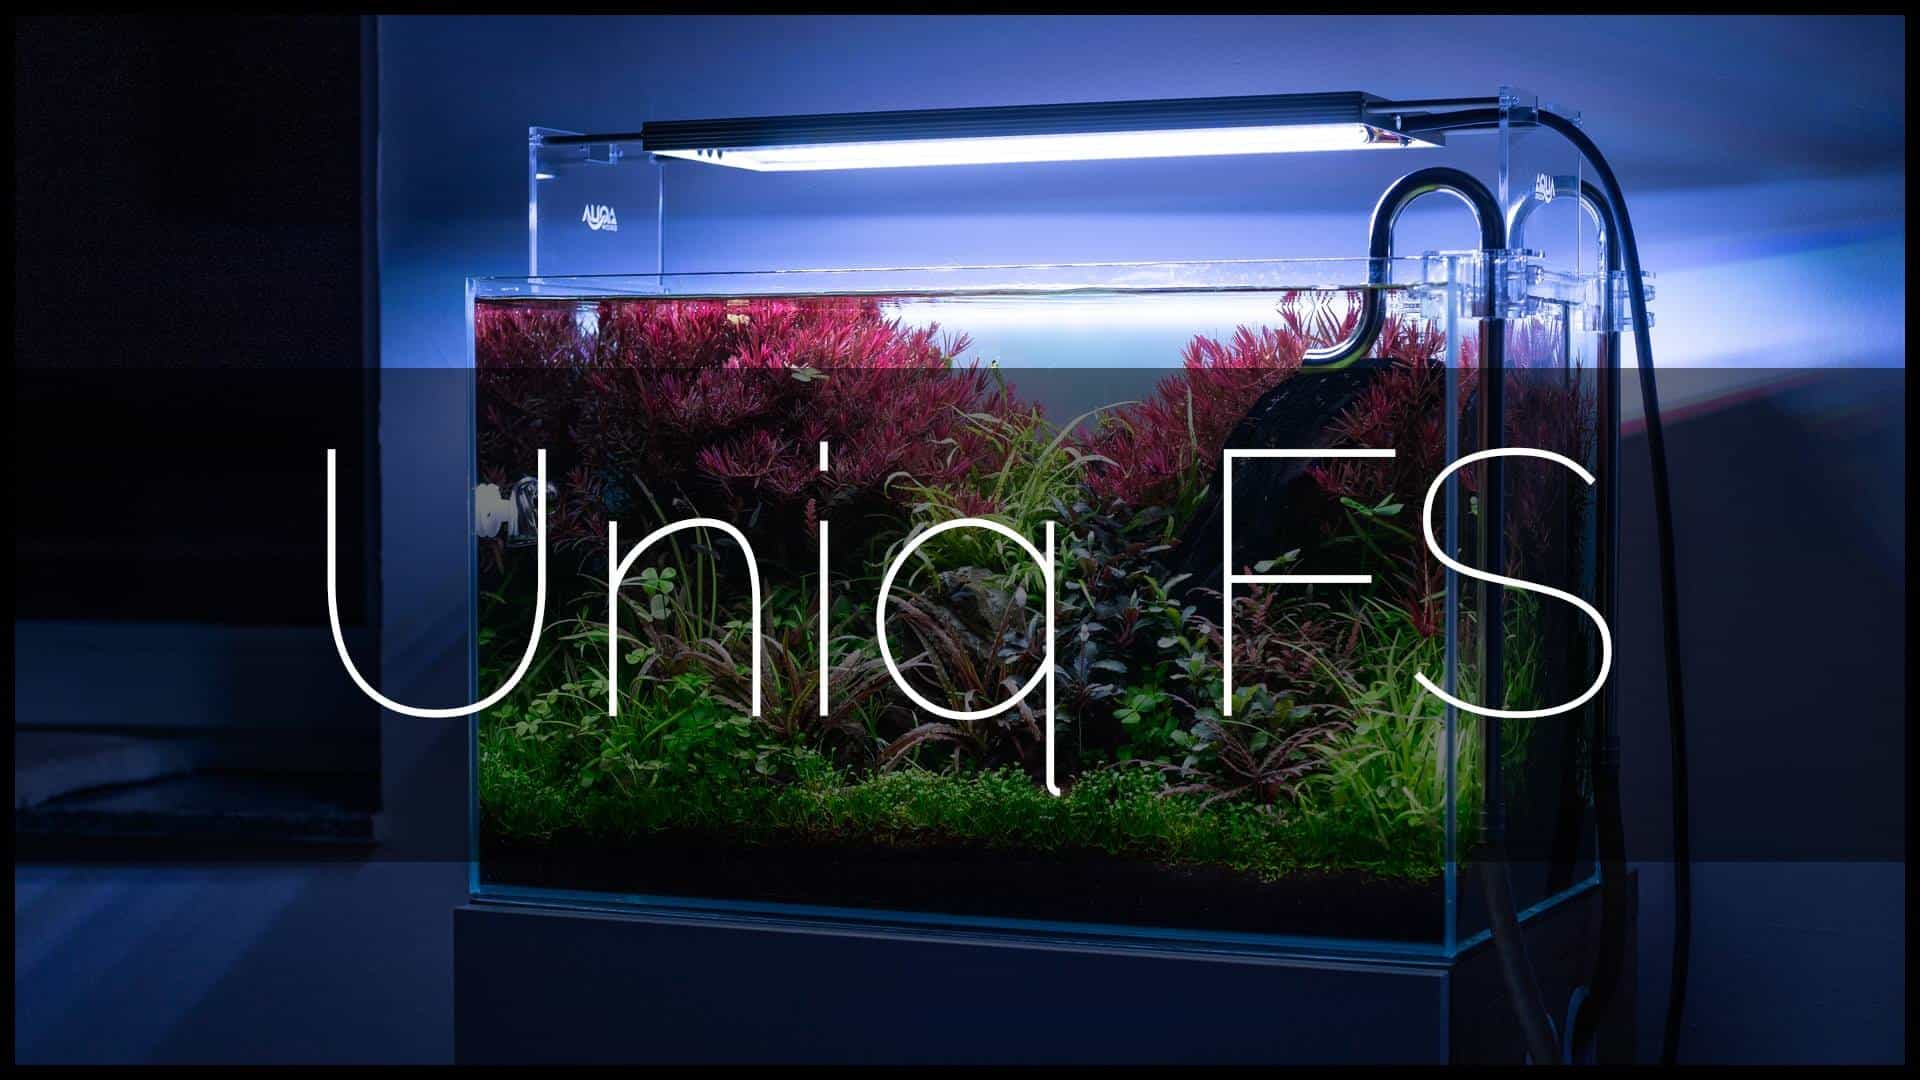 186 LED Aquarienbeleuchtung: Alle Details und Fakten zur Technik Teil 1 (Moritz Stapelfeld) 4